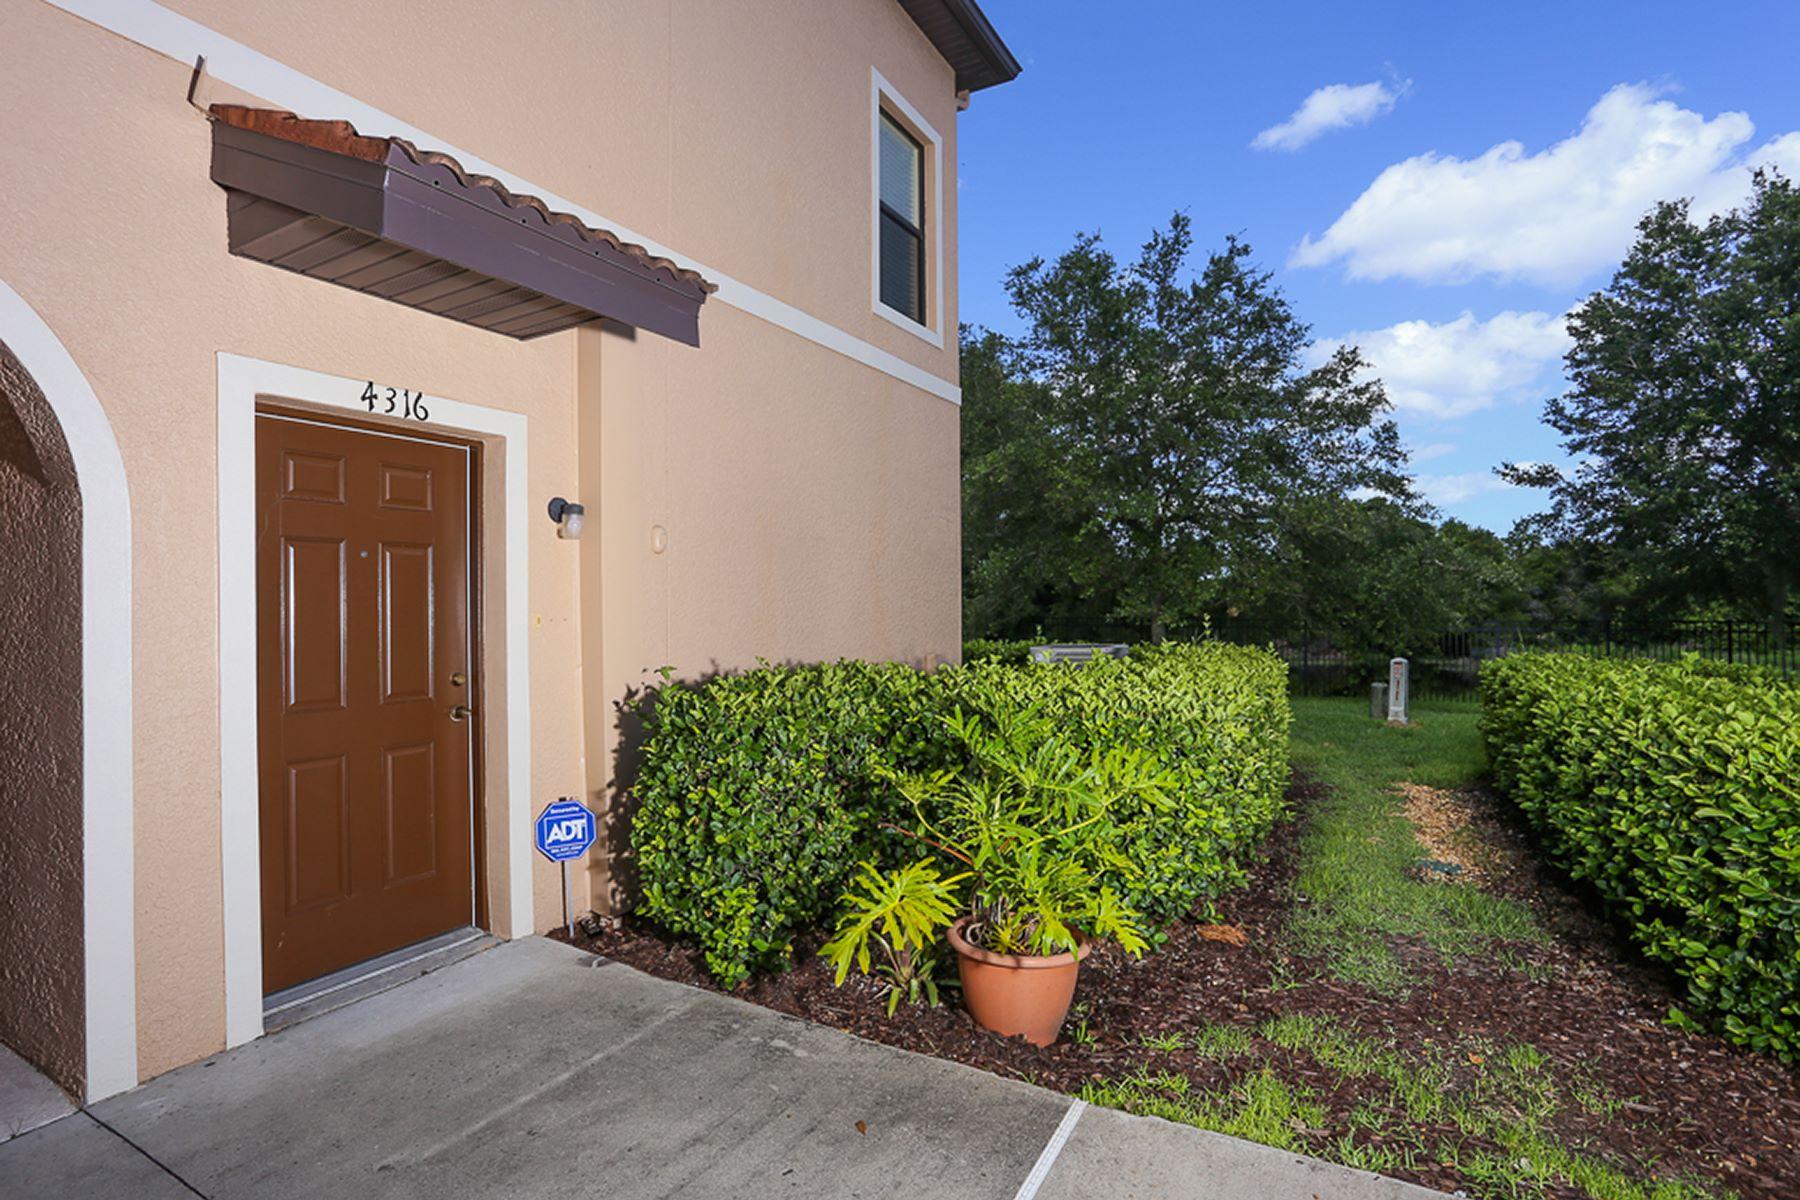 Condominium for Rent at SARASOTA - STONERIDGE 4316 Via Piedra Cir Sarasota, Florida 34233 United States